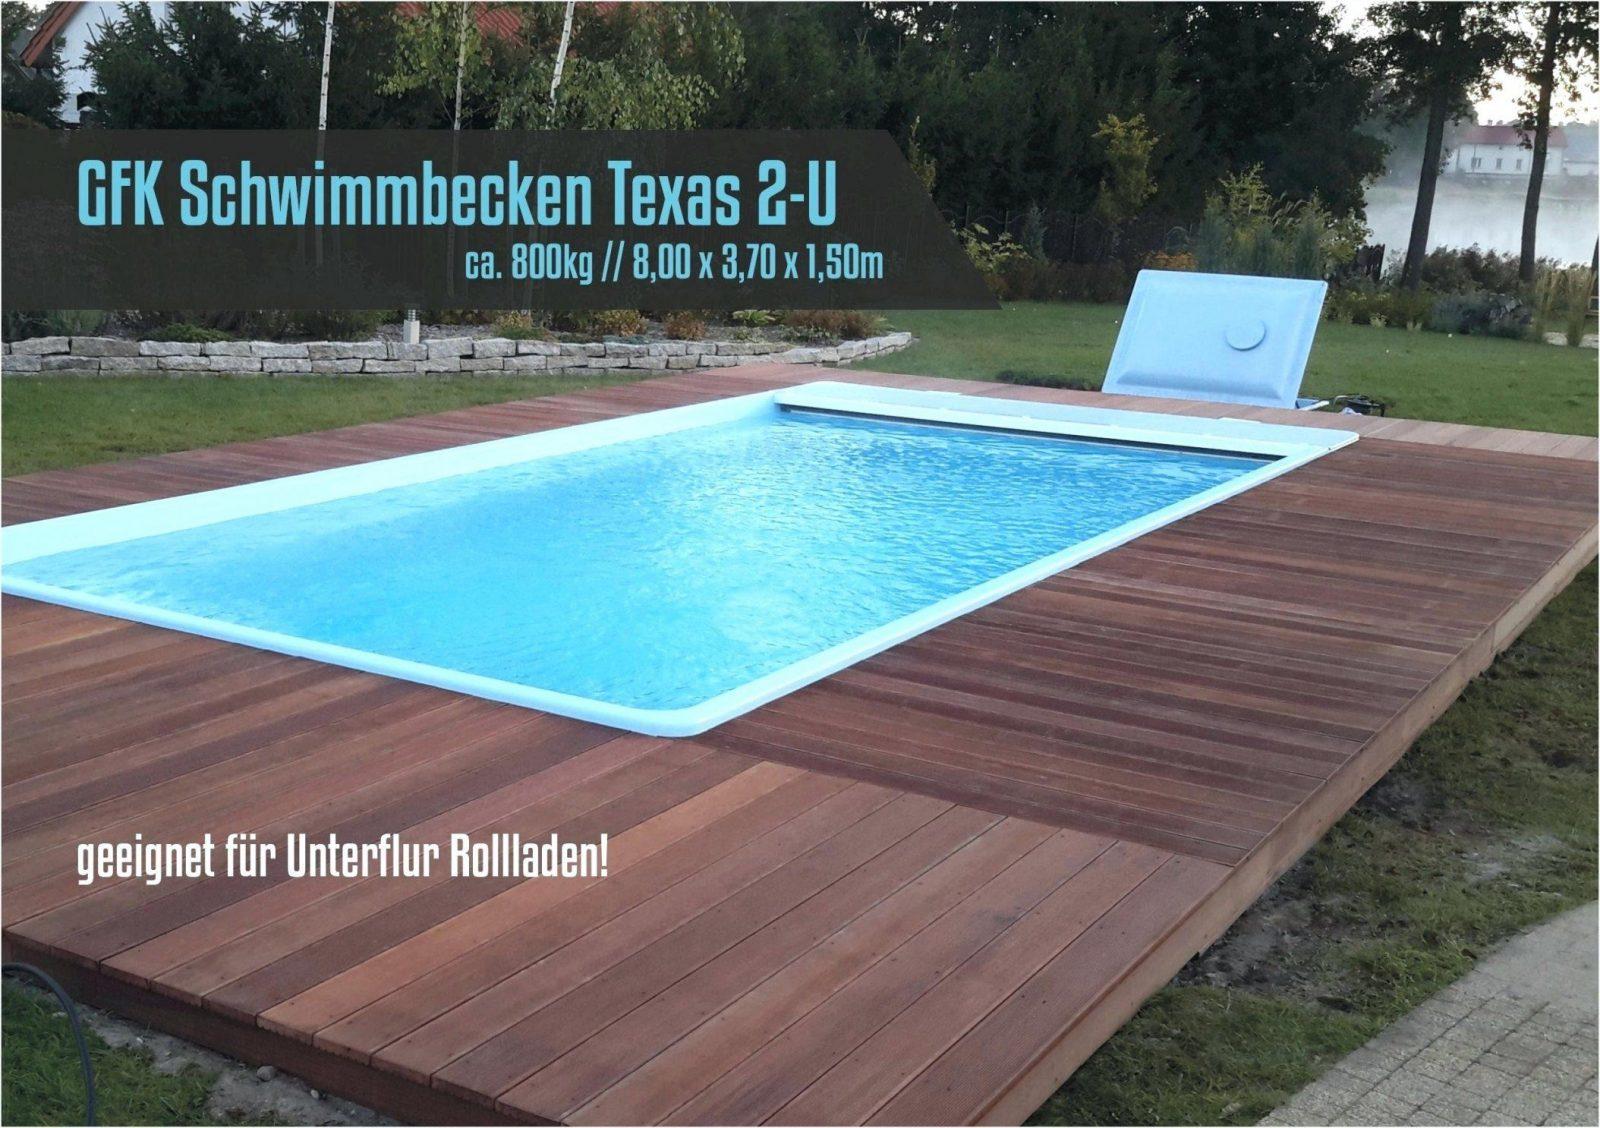 pool berdachung eigenbau pool und schwimmbad selber bauen kudo aus unserem forum pool. Black Bedroom Furniture Sets. Home Design Ideas